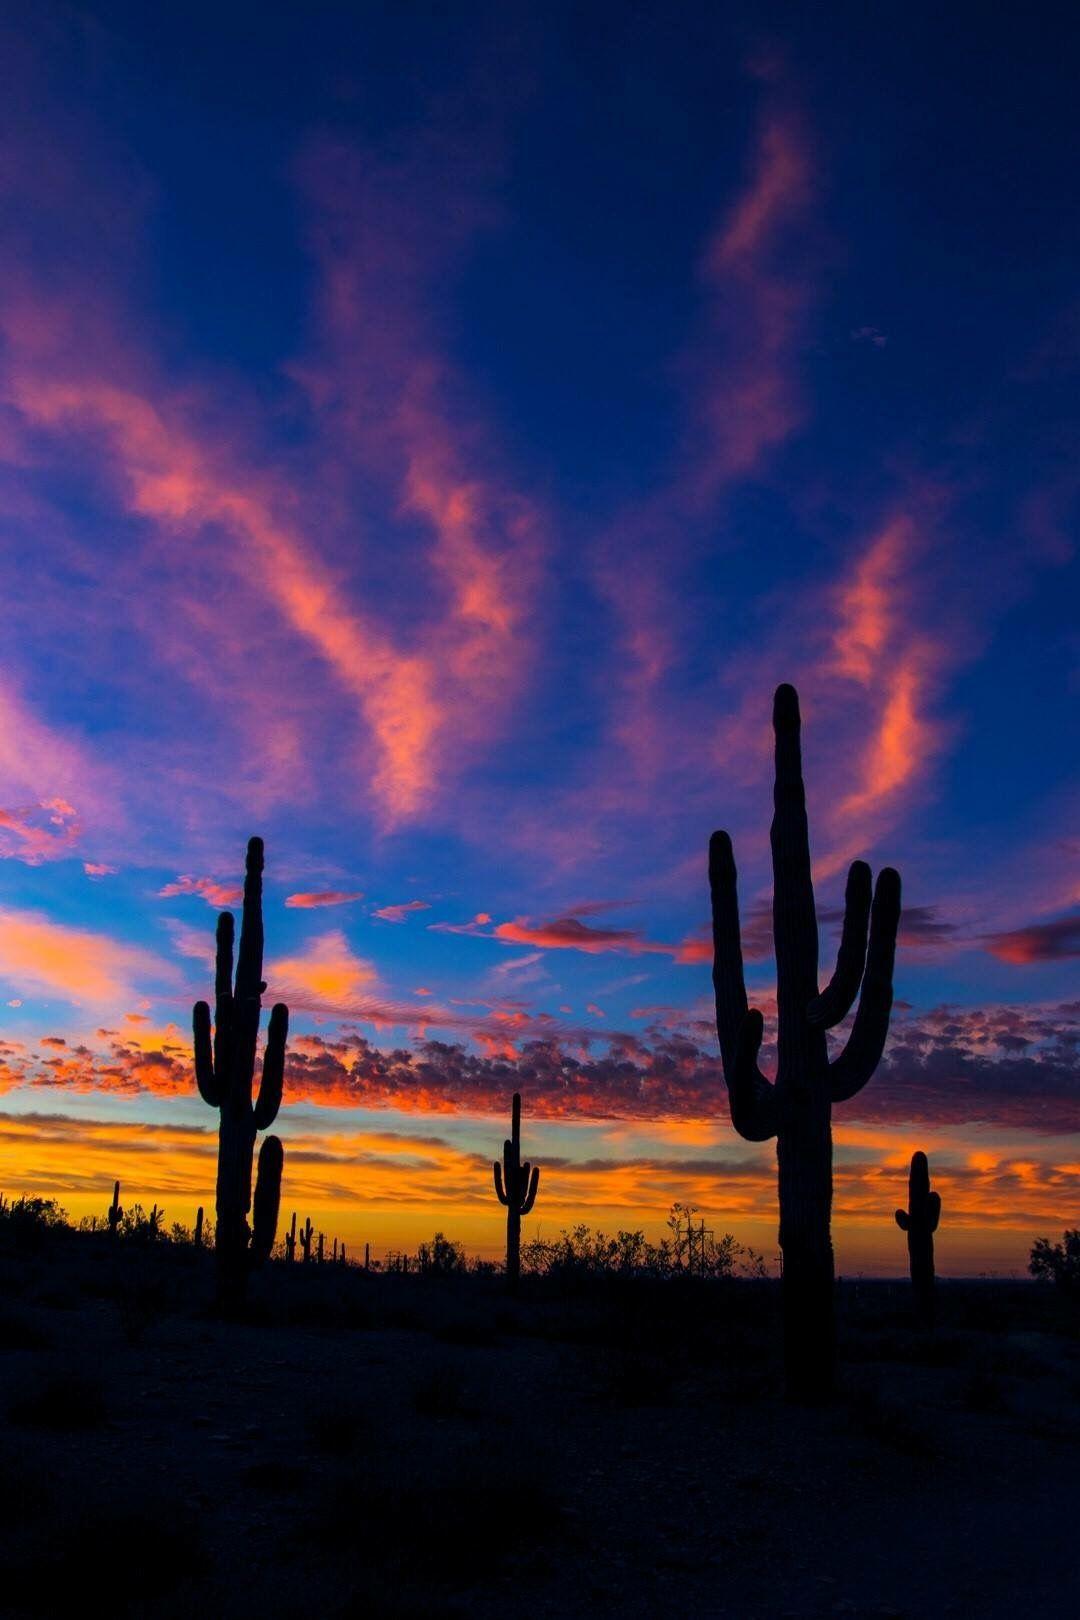 Arizona Night Sky Photograph by Amy Chesnut